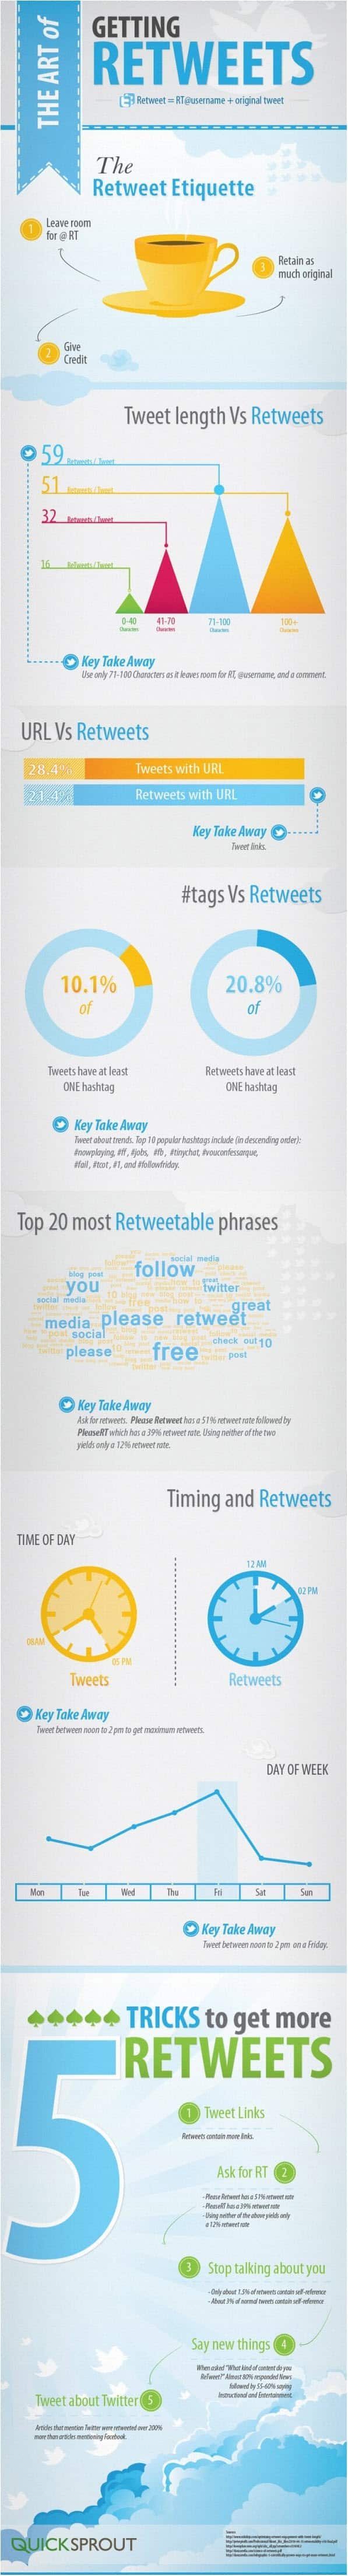 générer-retweets-twitter